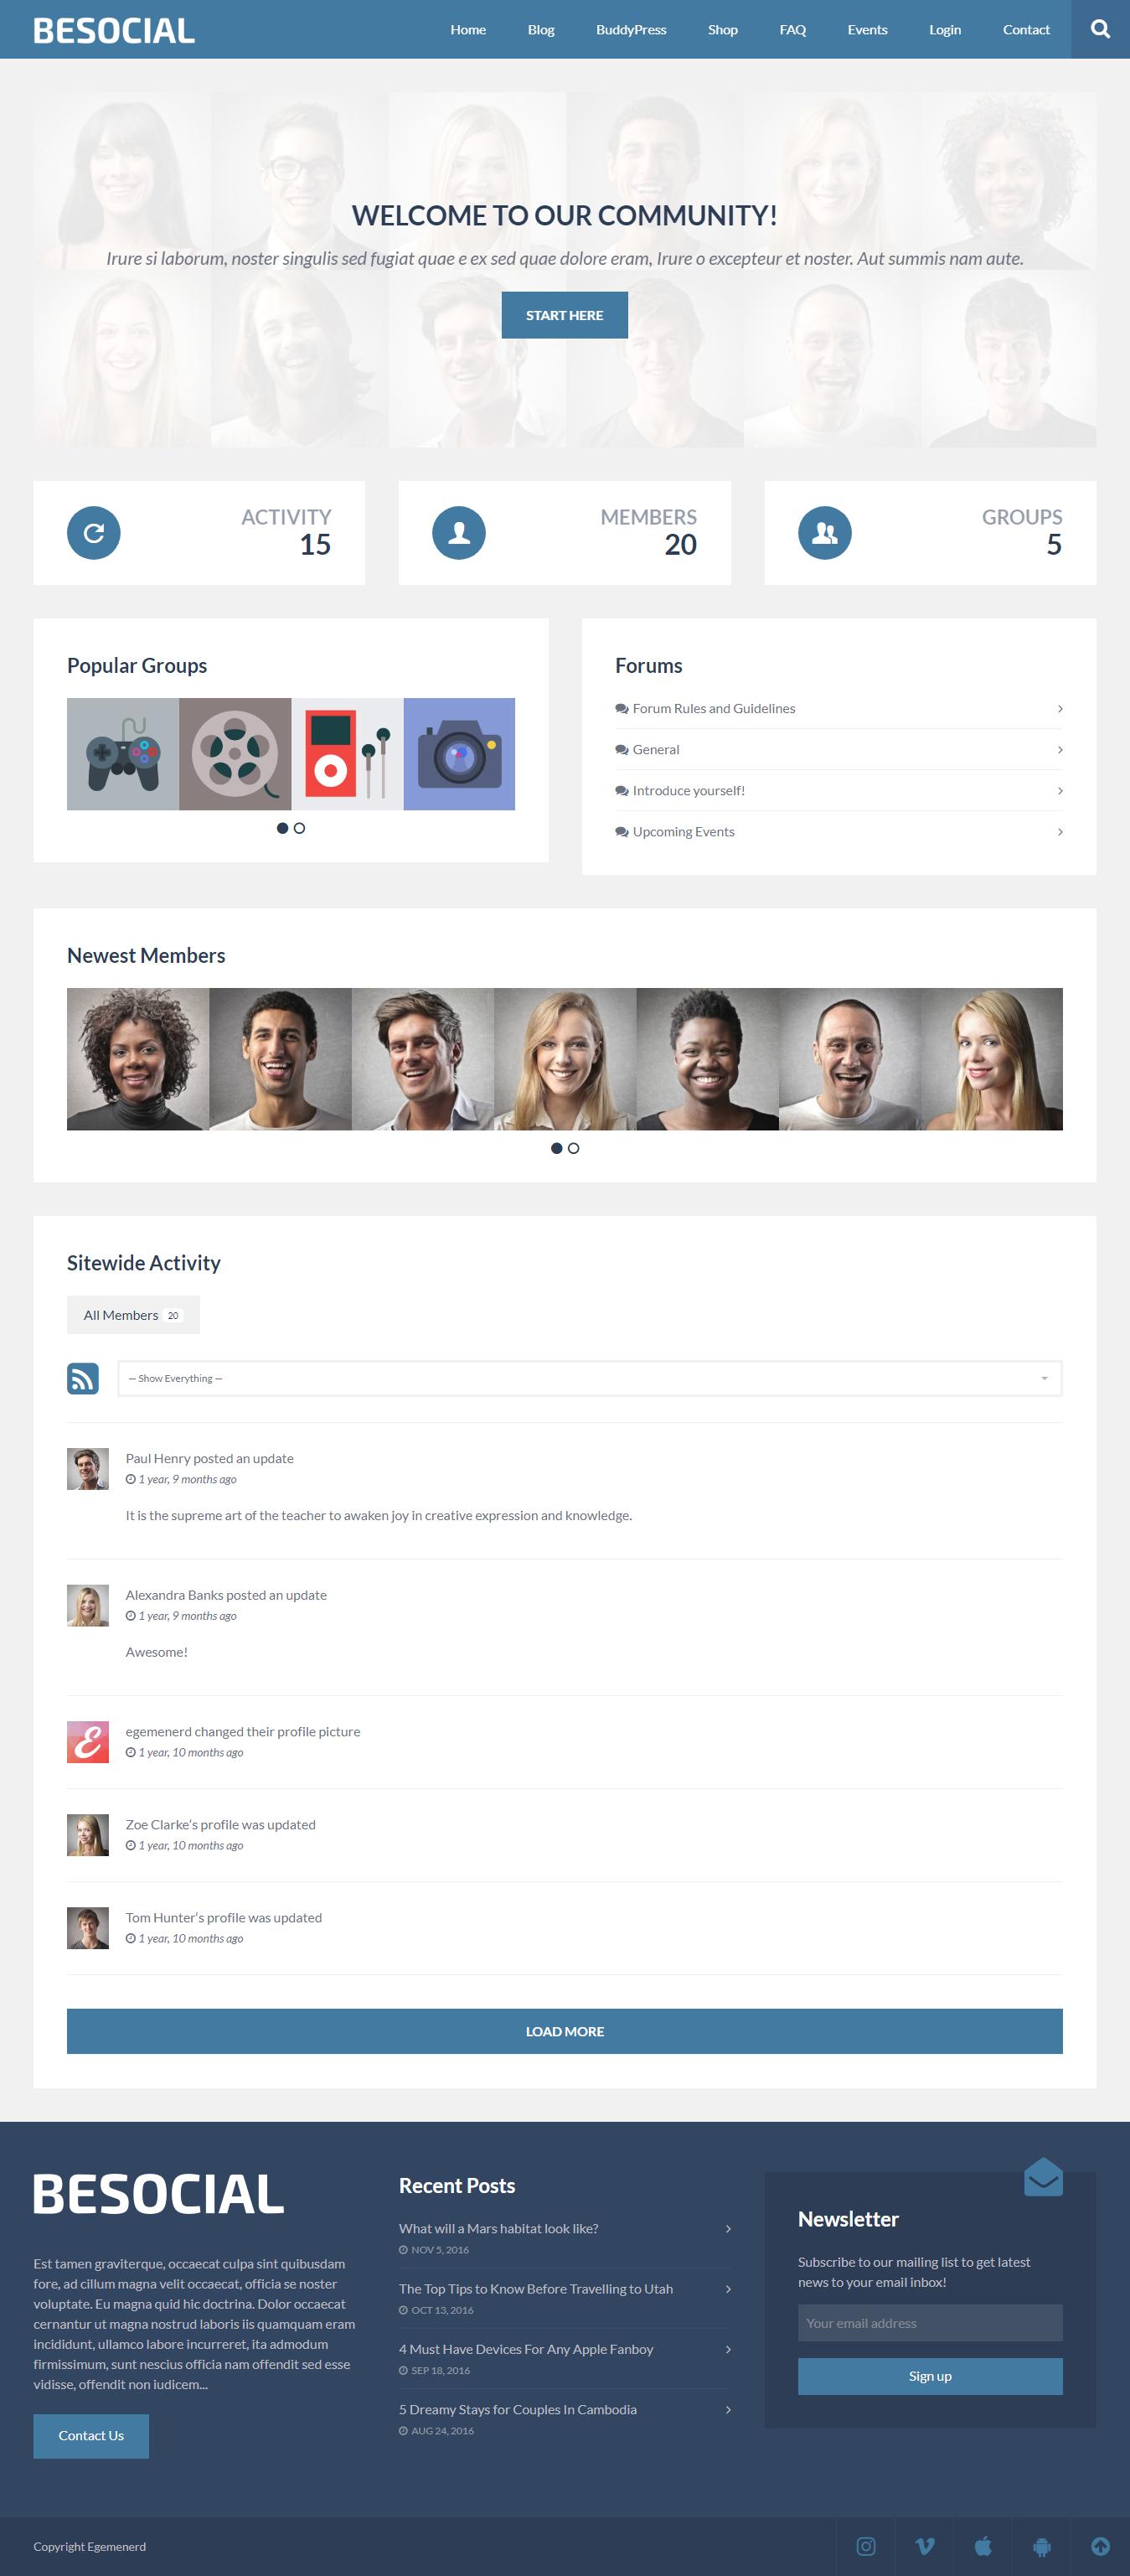 besocial best premium buddypress wordpress theme - 10+ Best Premium BuddyPress WordPress Themes